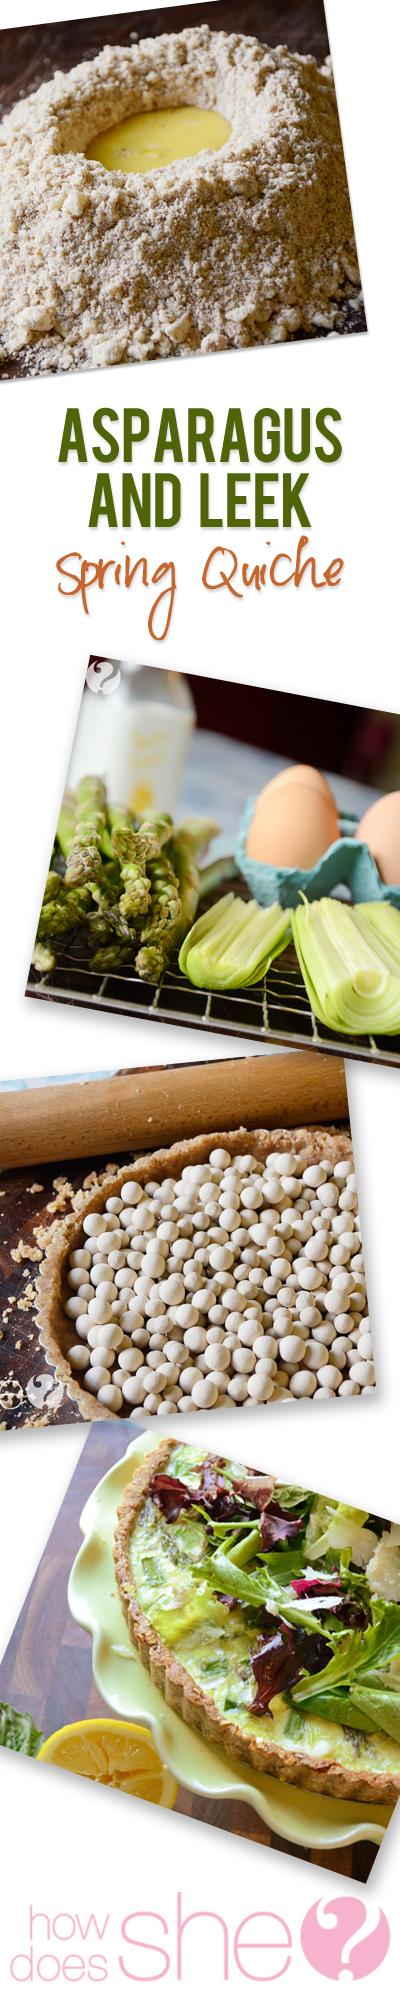 Asparagus and Leek Spring Quiche recipe